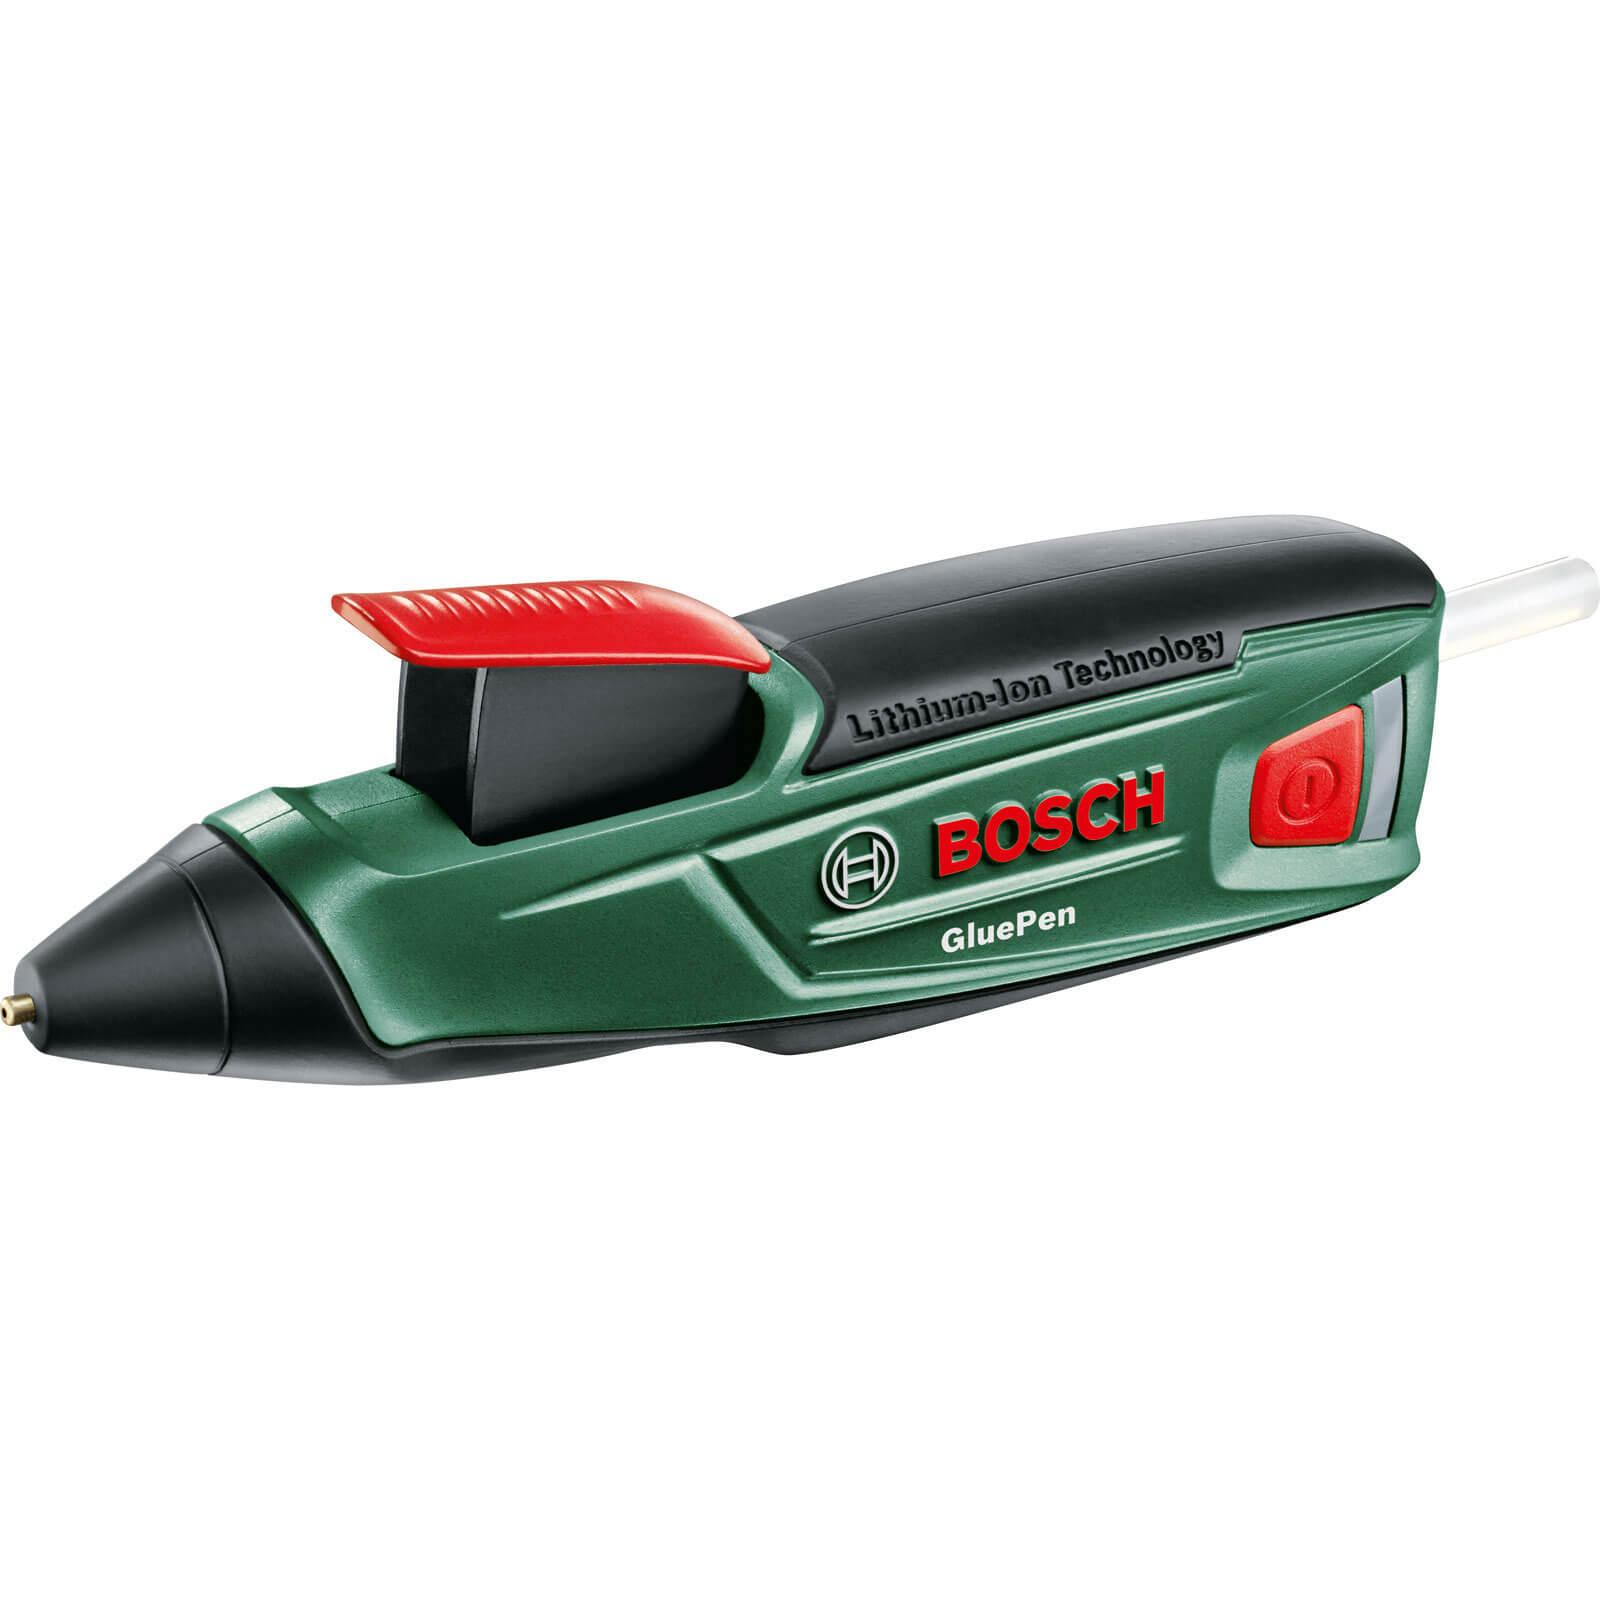 Bosch Cordless Lithium-ion Glue Pen